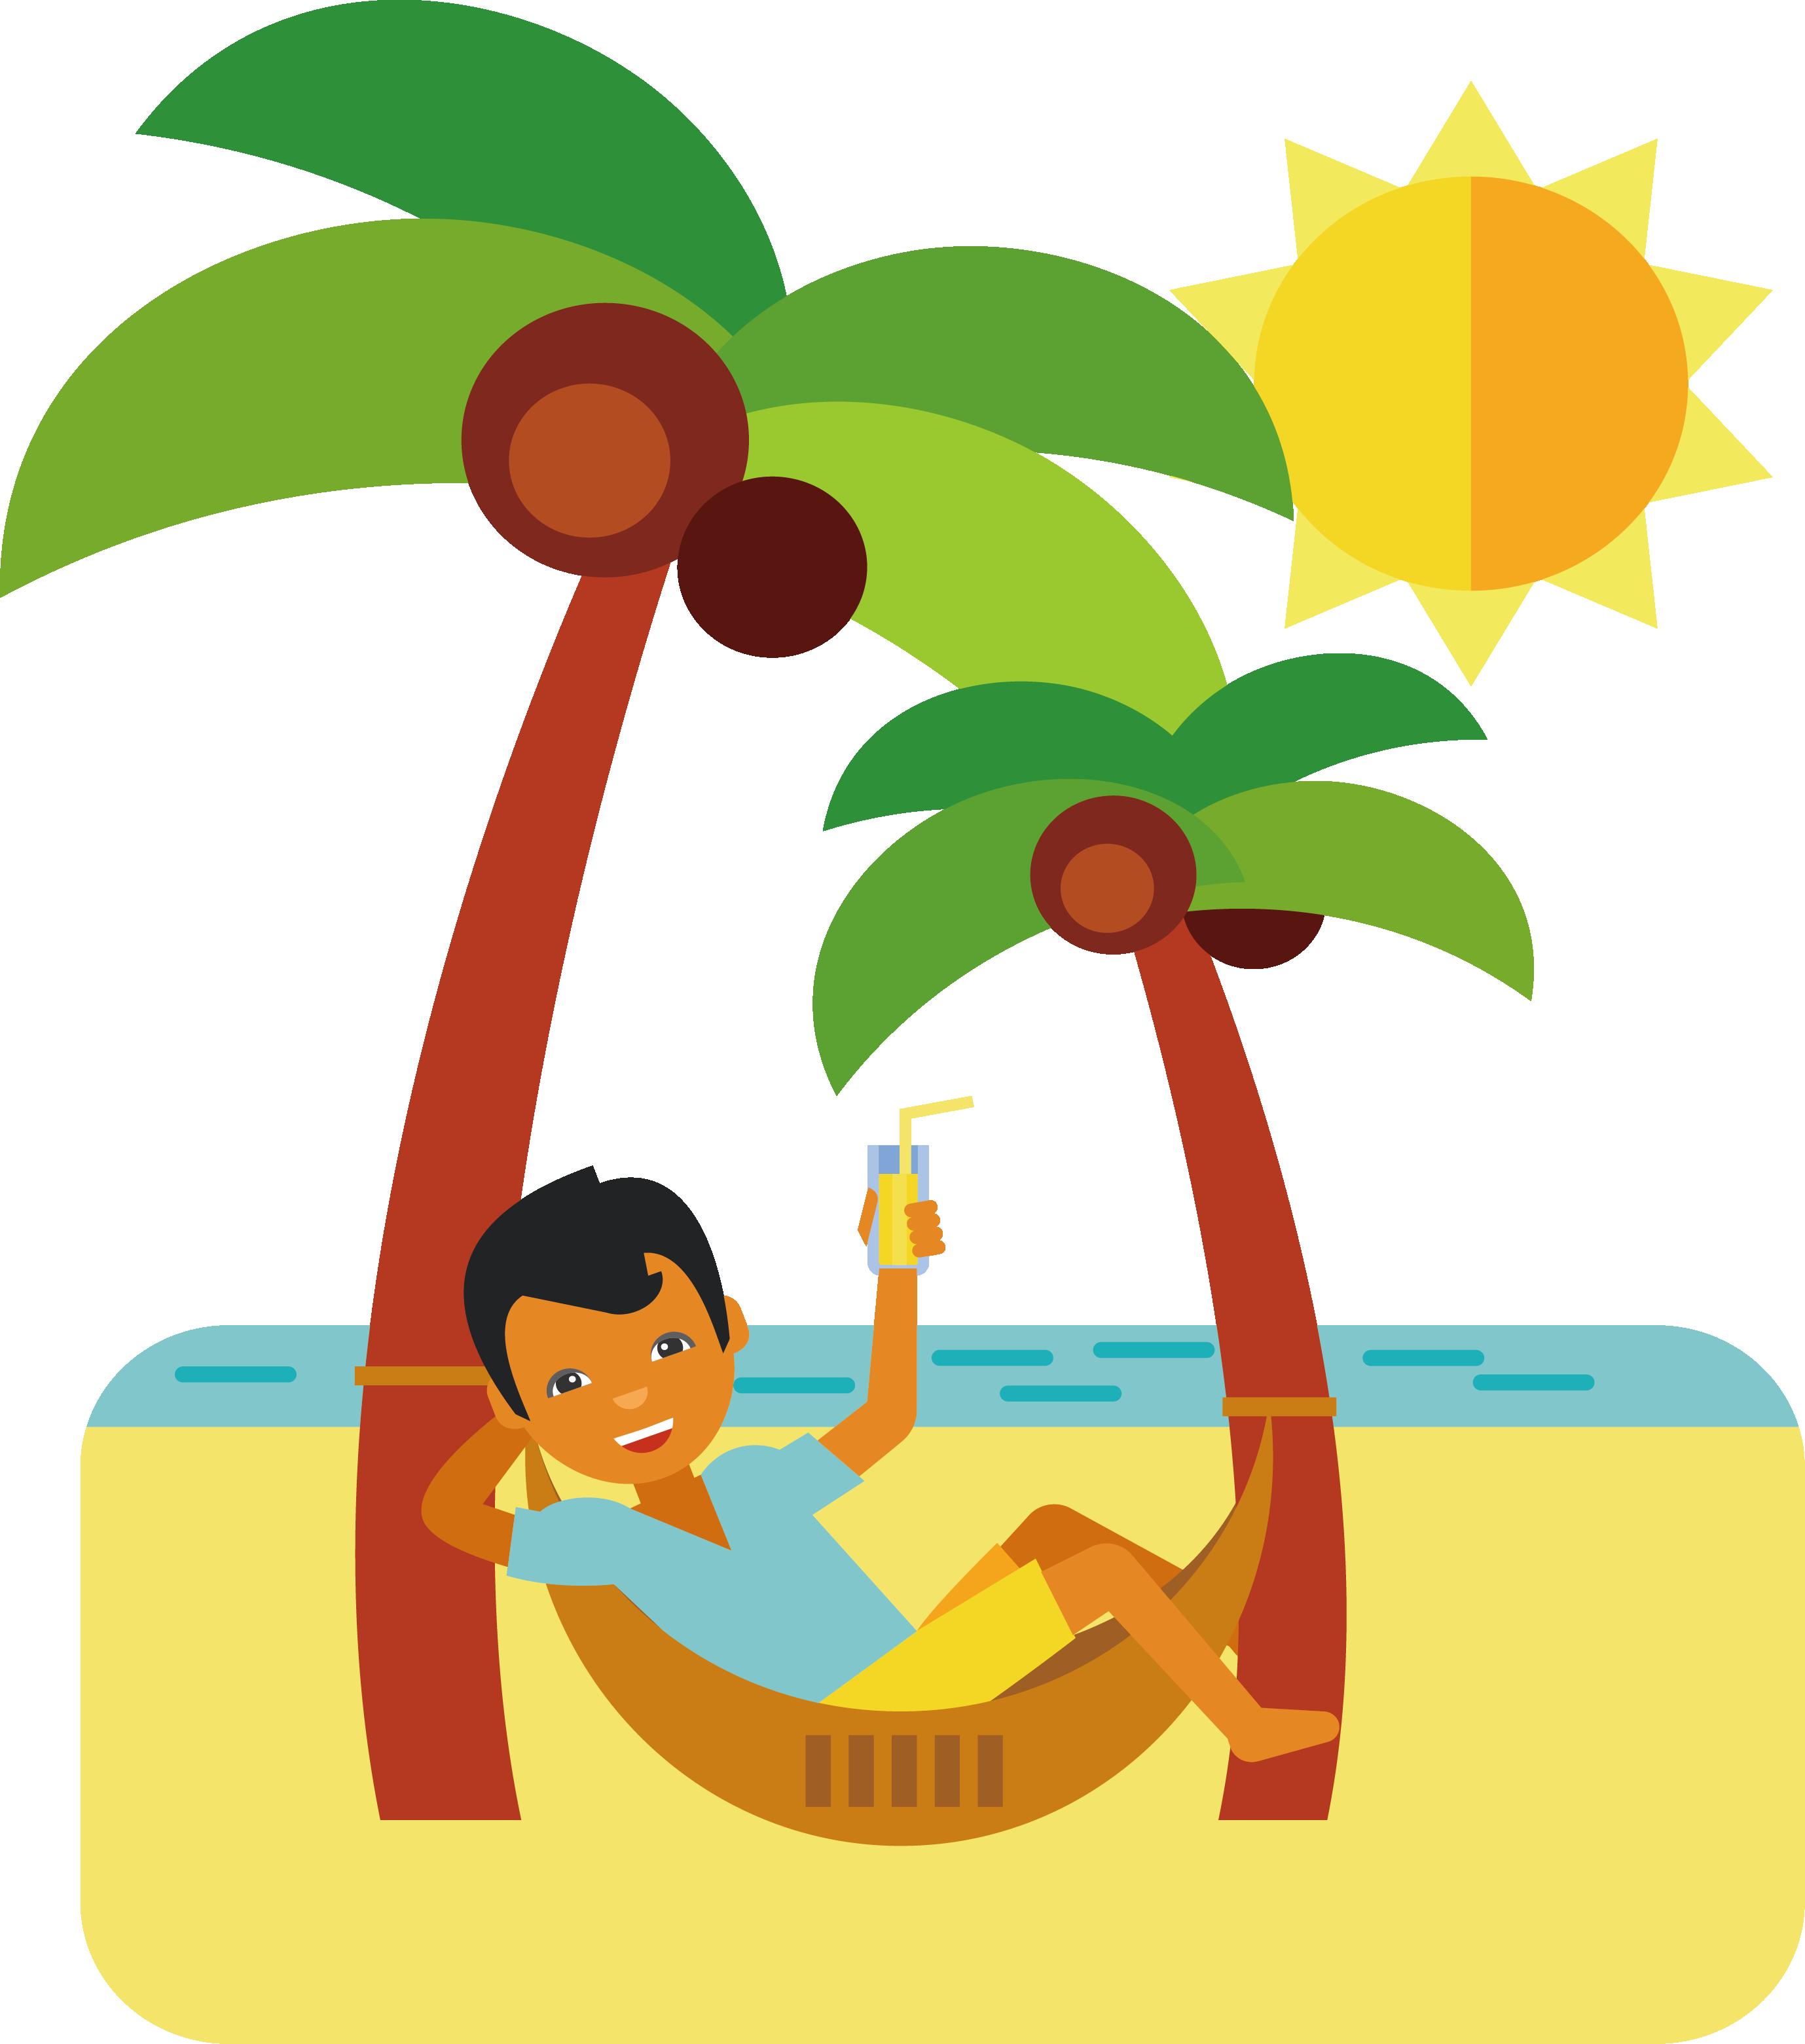 Human tree clipart clipart download Cartoon Beach Clip art - Beach vacation time 2757*3122 transprent ... clipart download